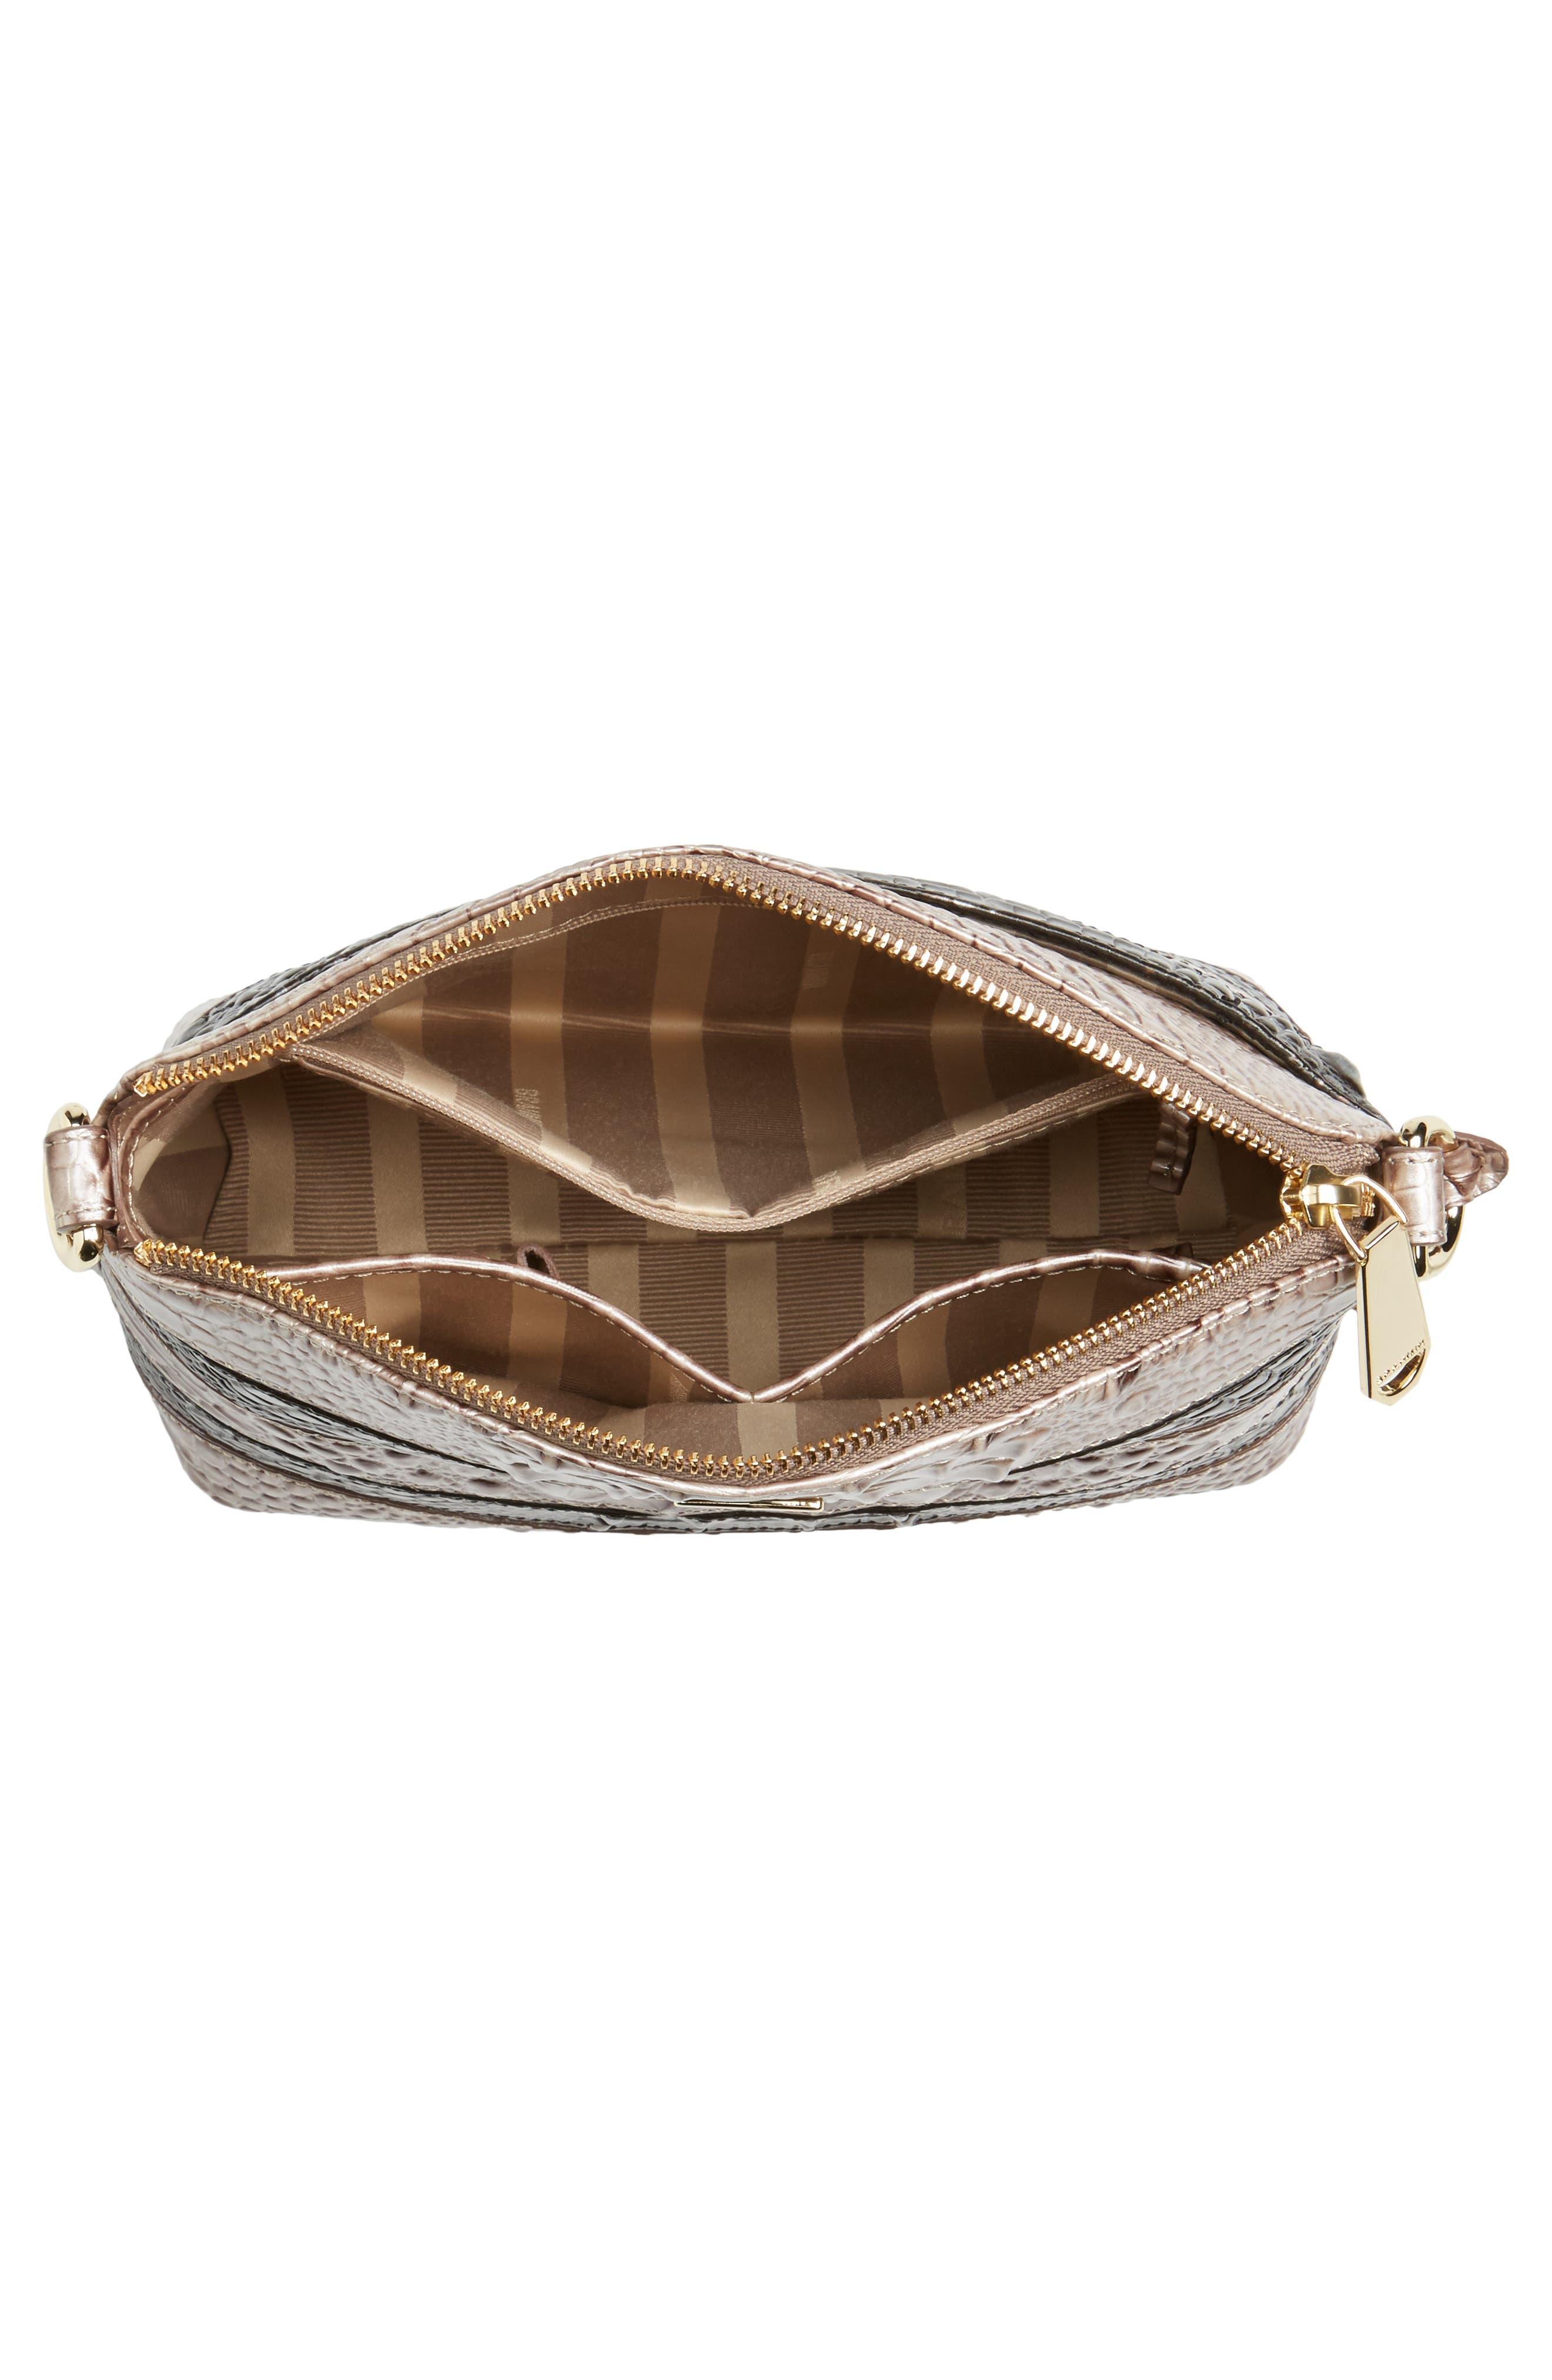 Mini Duxbury Leather Crossbody Bag,                             Alternate thumbnail 4, color,                             210